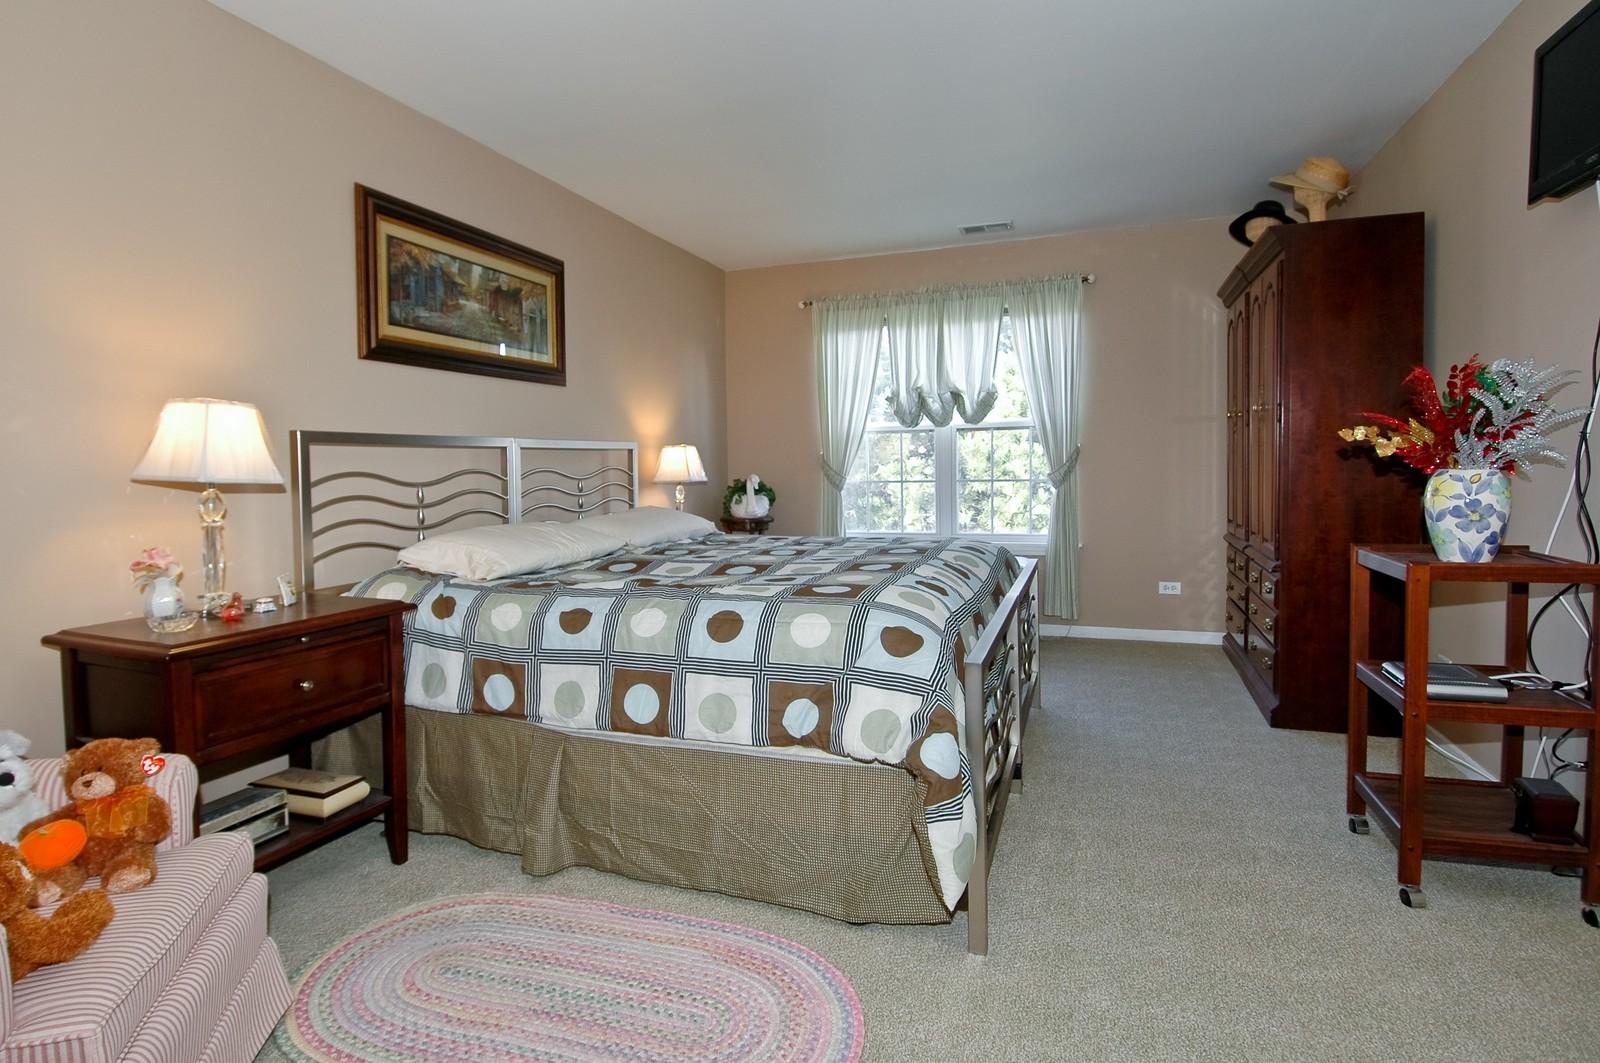 Real Estate Photography - 346 Crystal Ridge, Crystal Lake, IL, 60014 - Master Bedroom